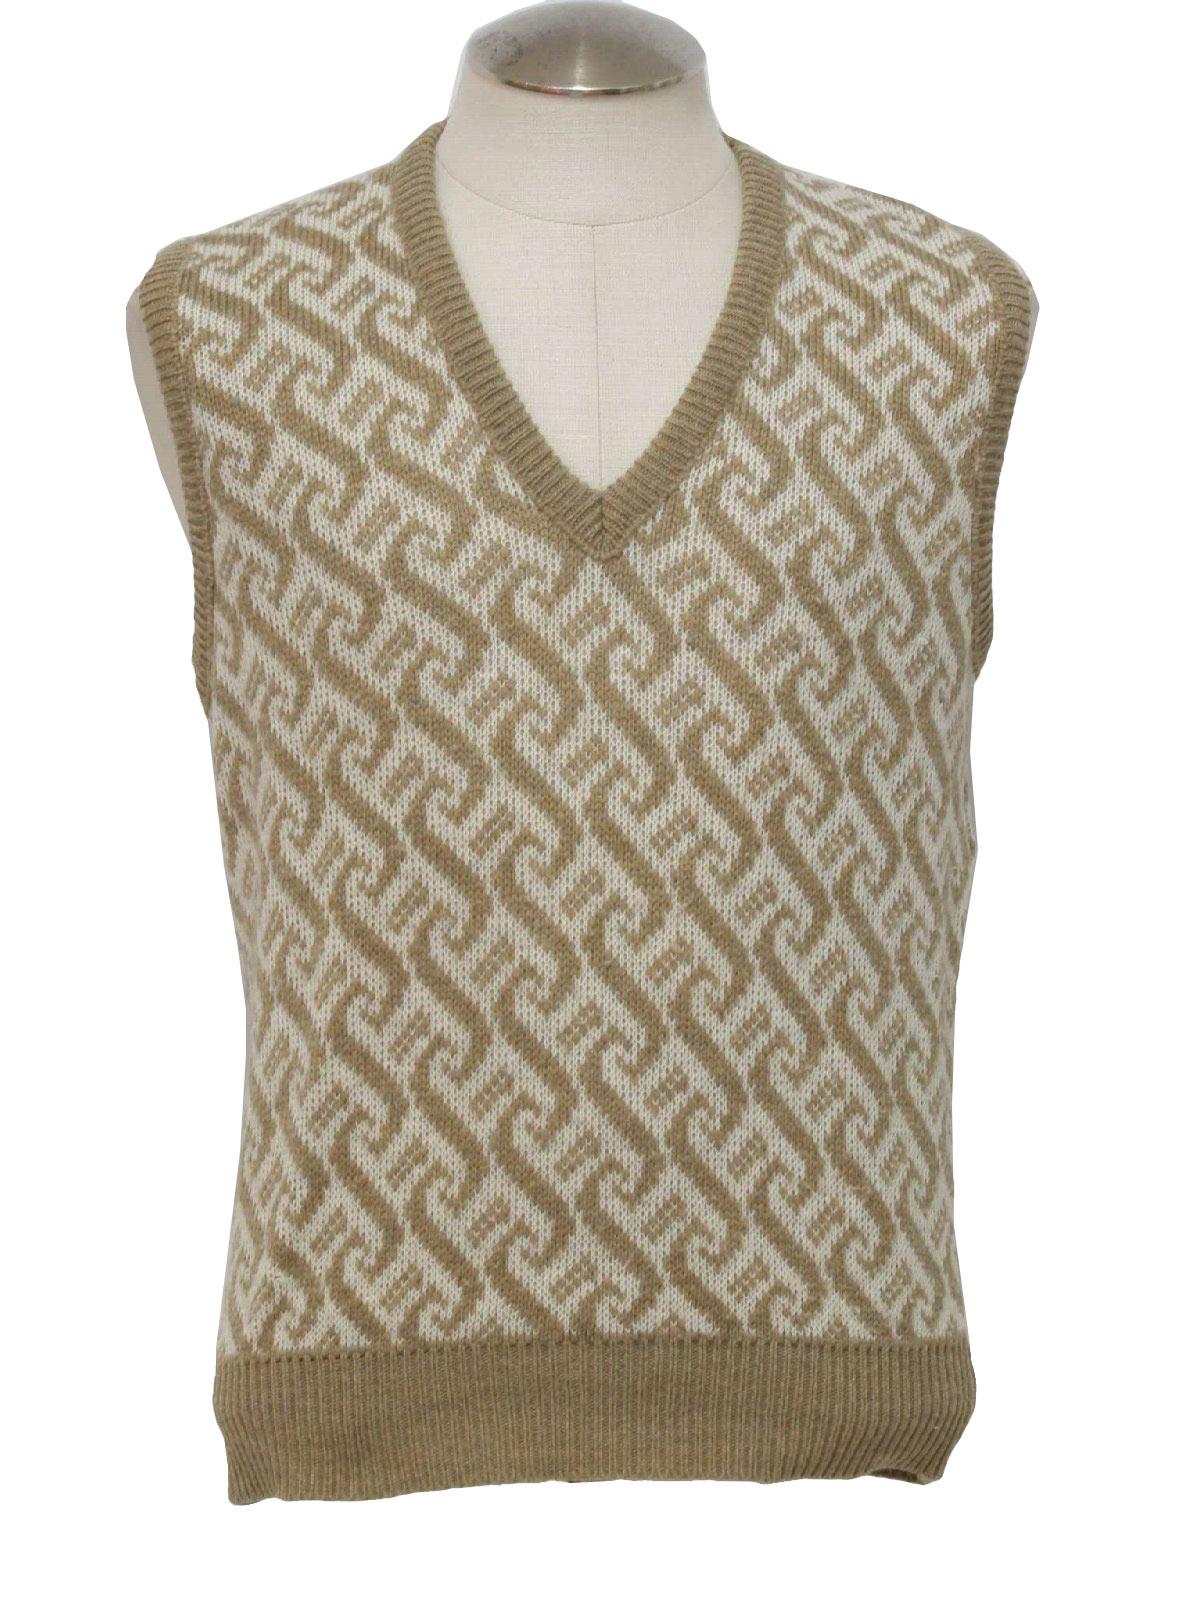 Seventies London Fog Sweater: 70s -London Fog- Mens light brown ...